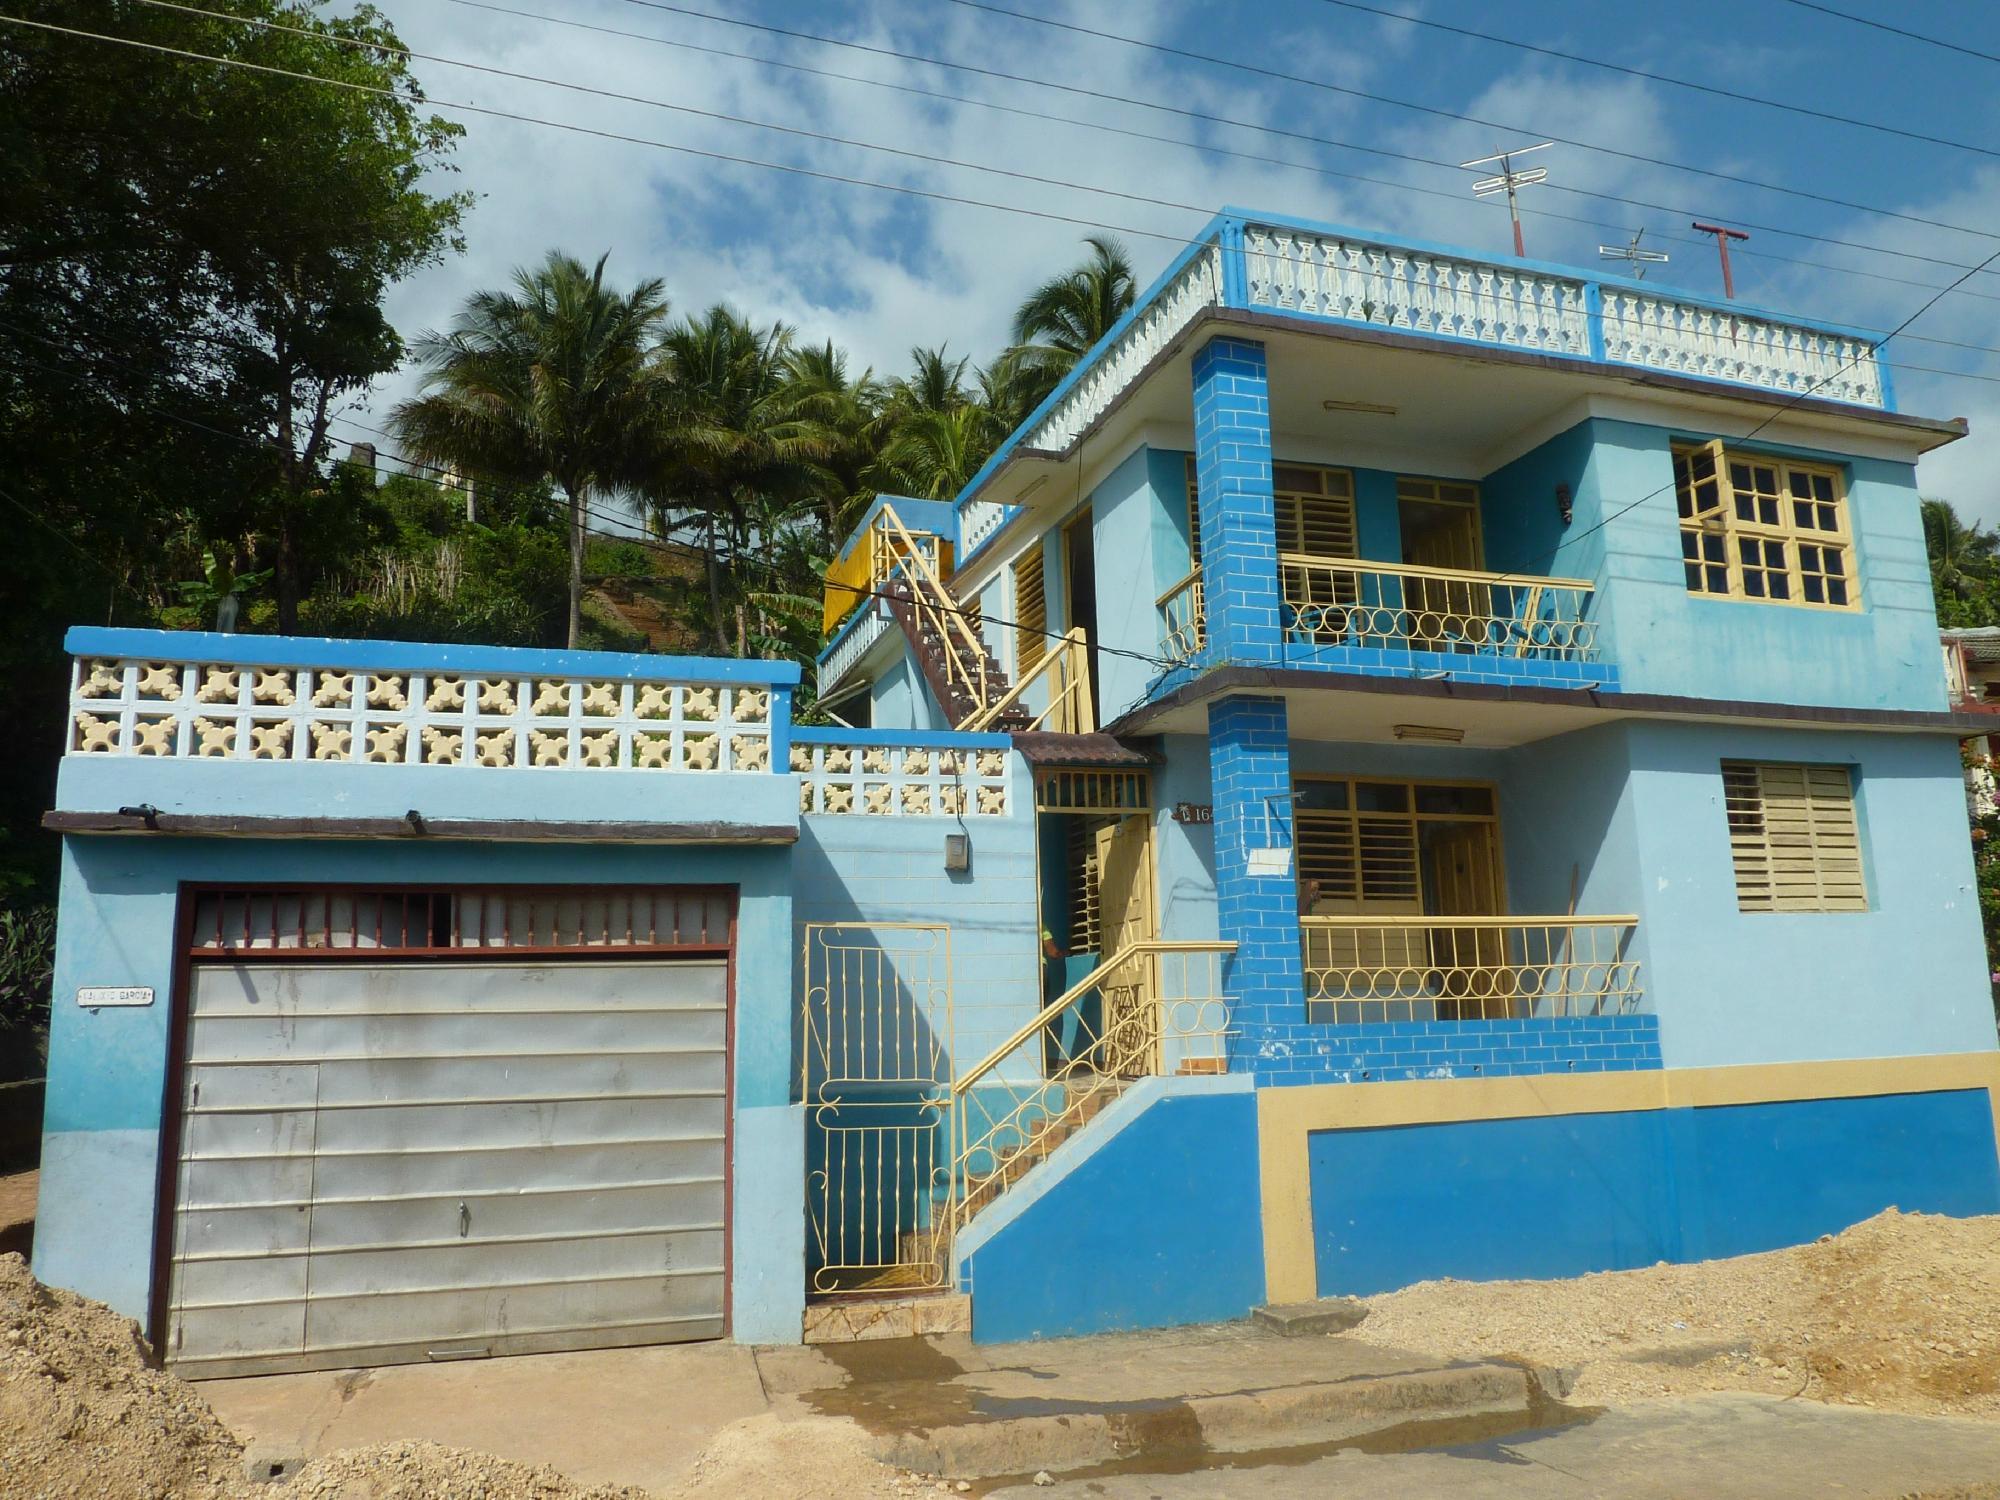 Casa Isabel Garrido